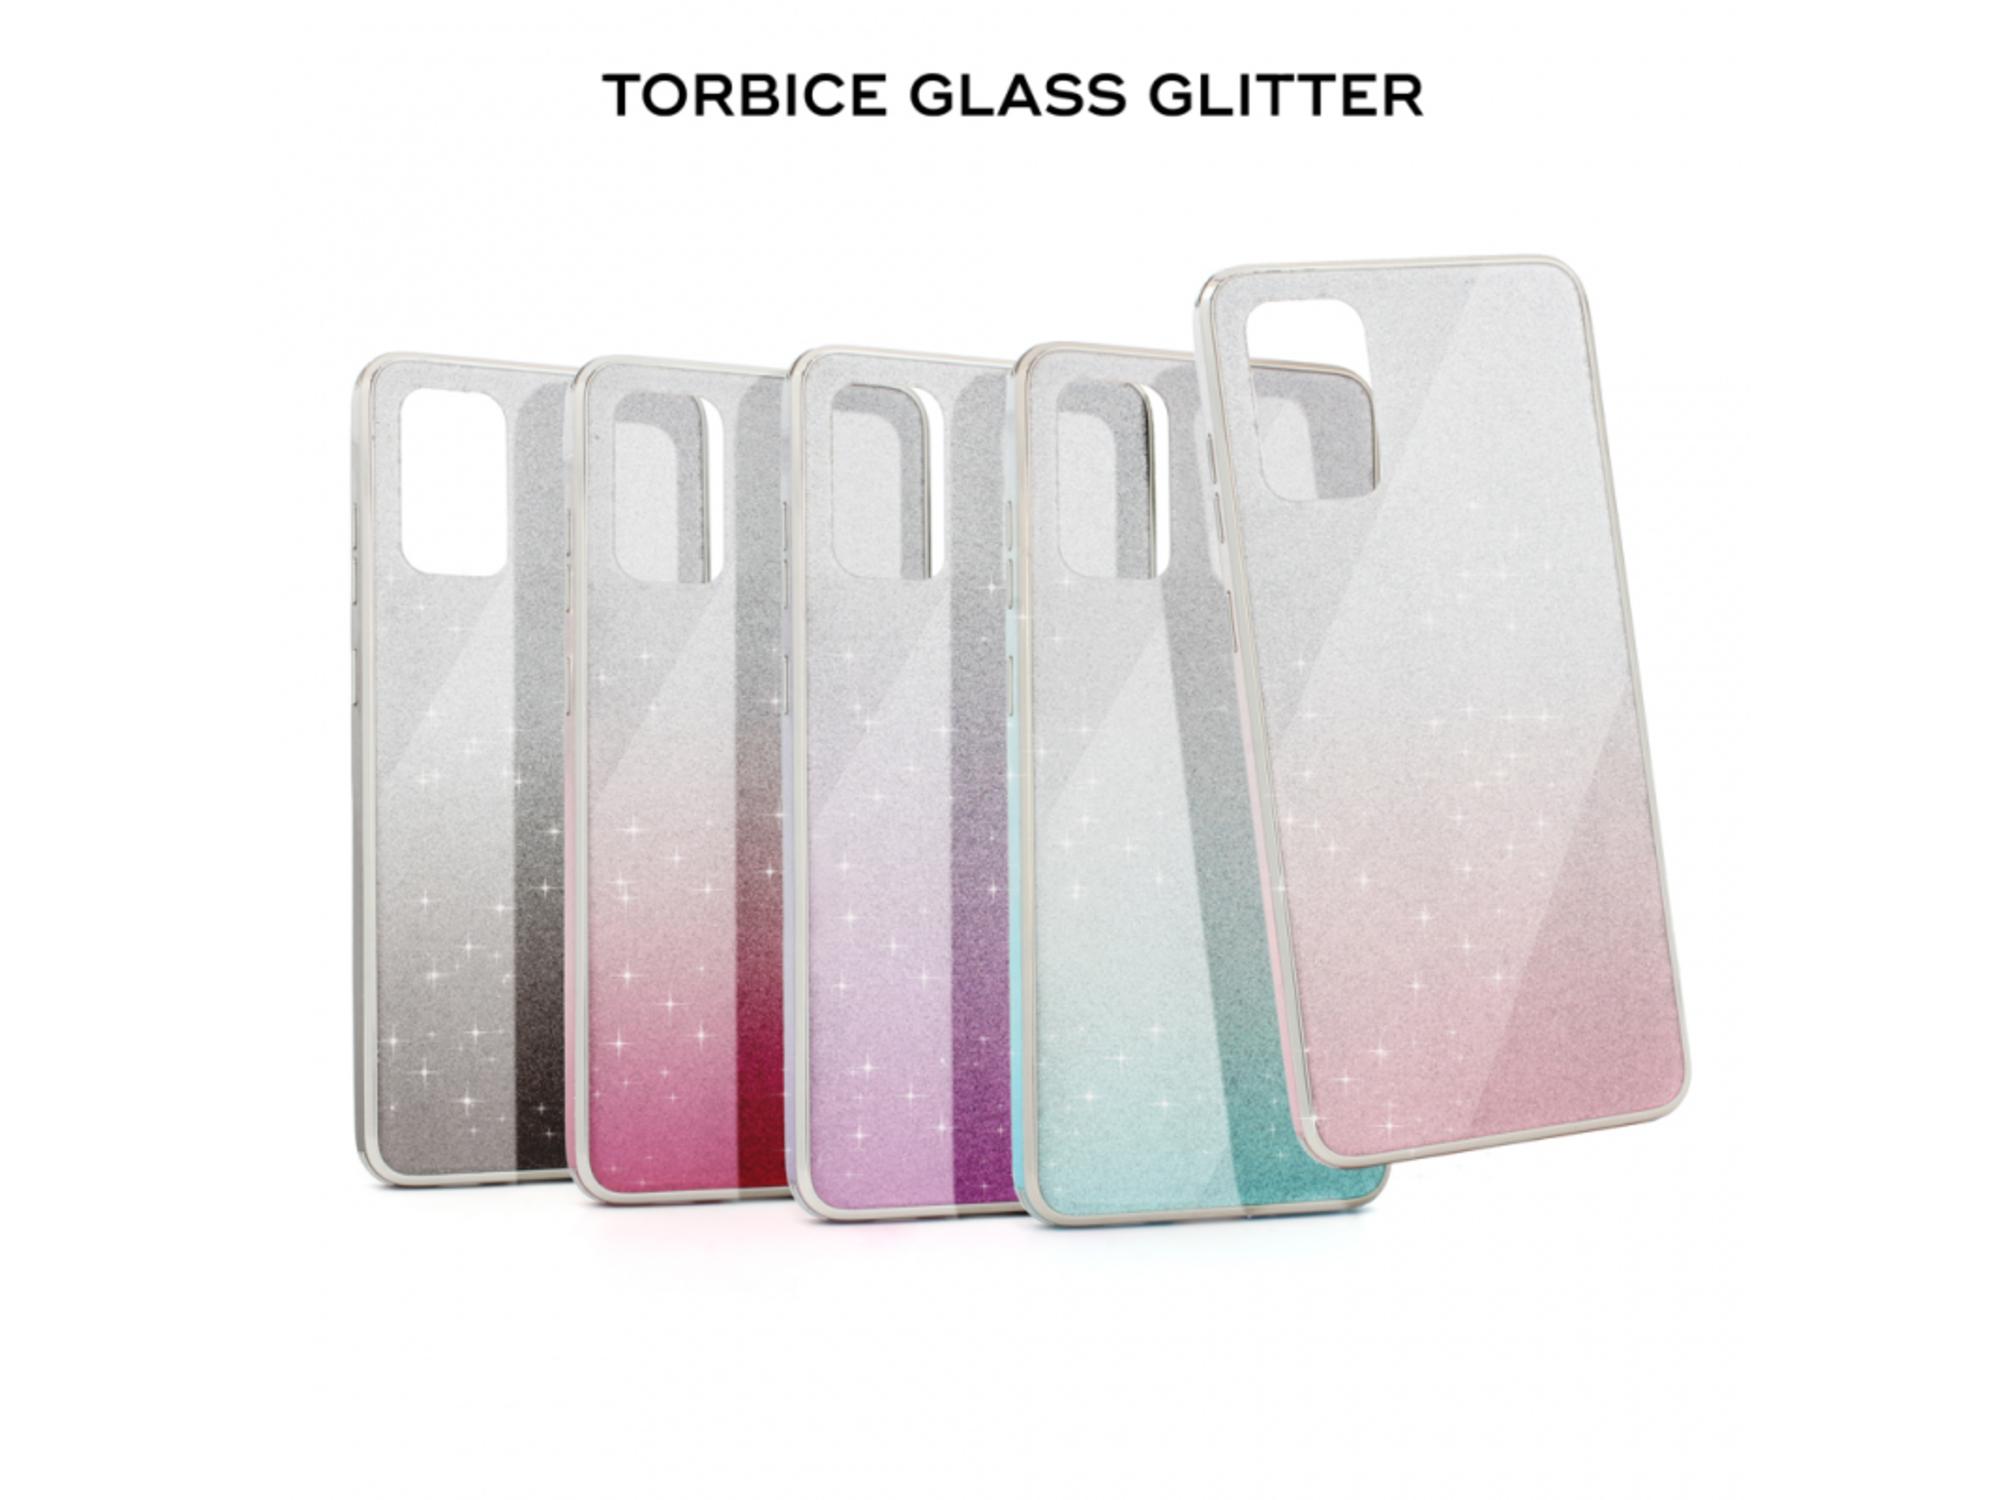 Torbica Glass Glitter za iPhone 11 Pro 5.8